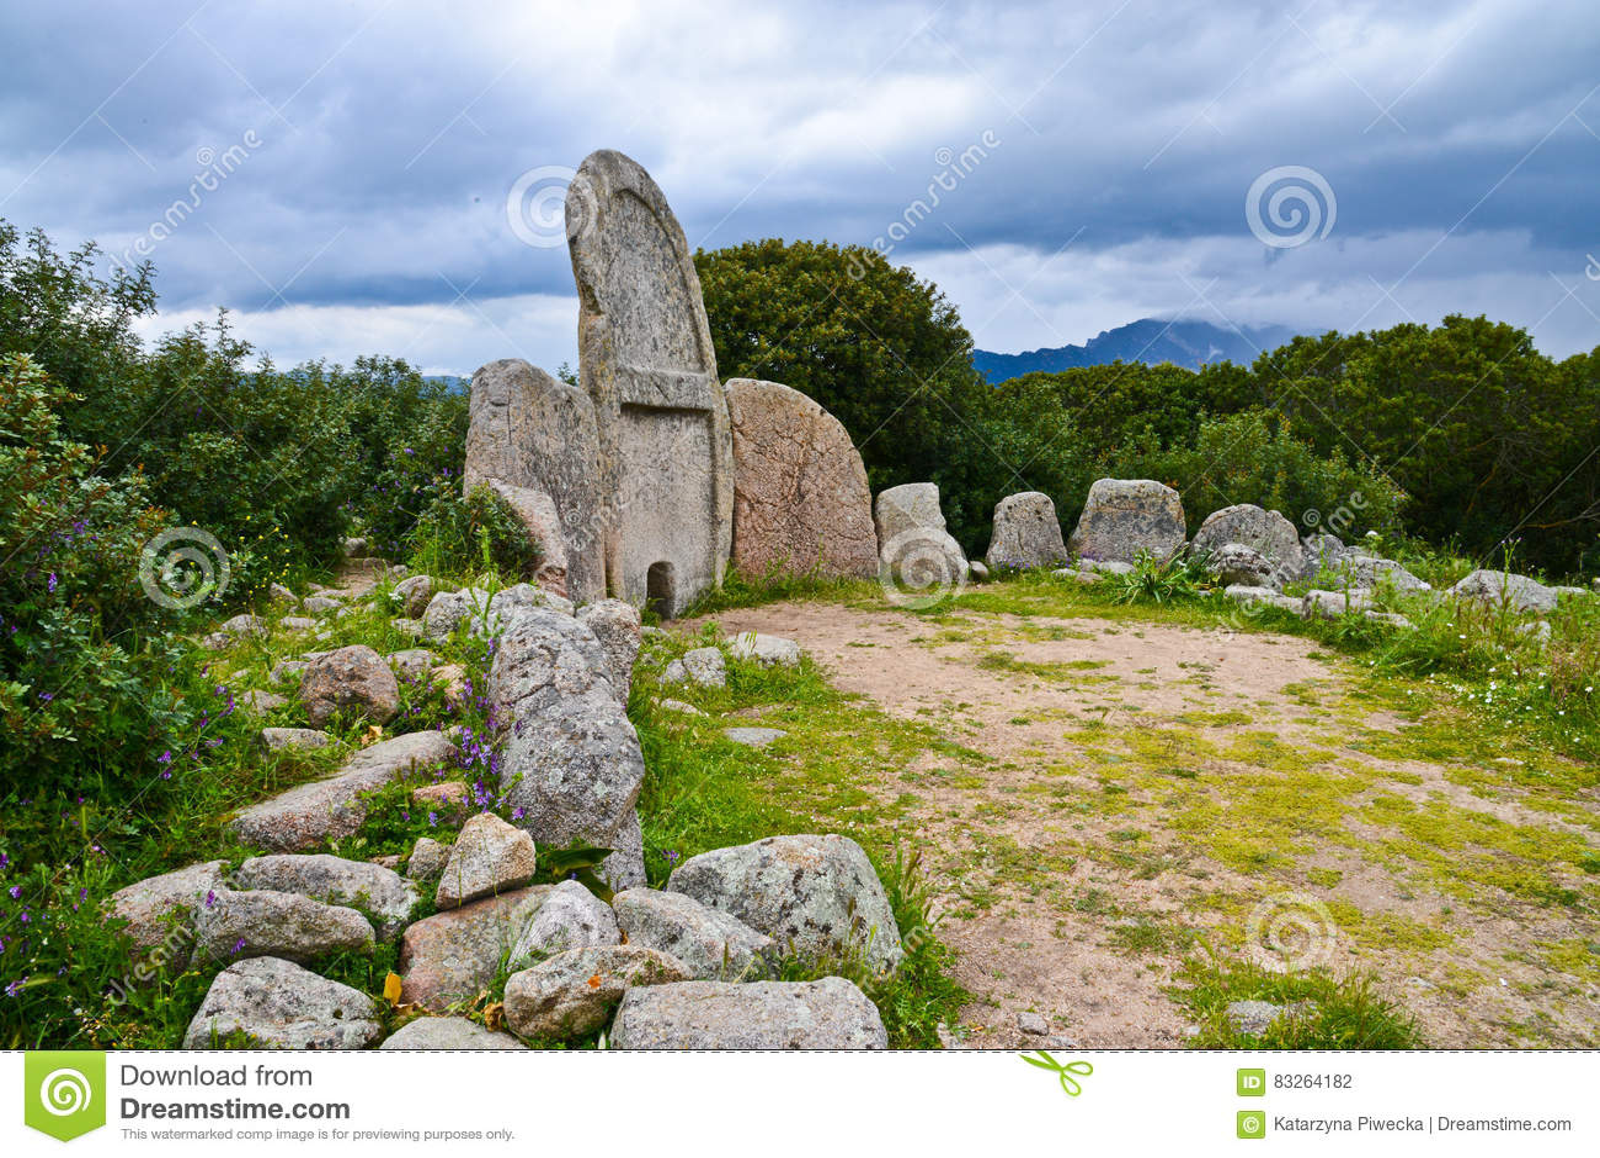 Giants` grave, Sardinia, Italy